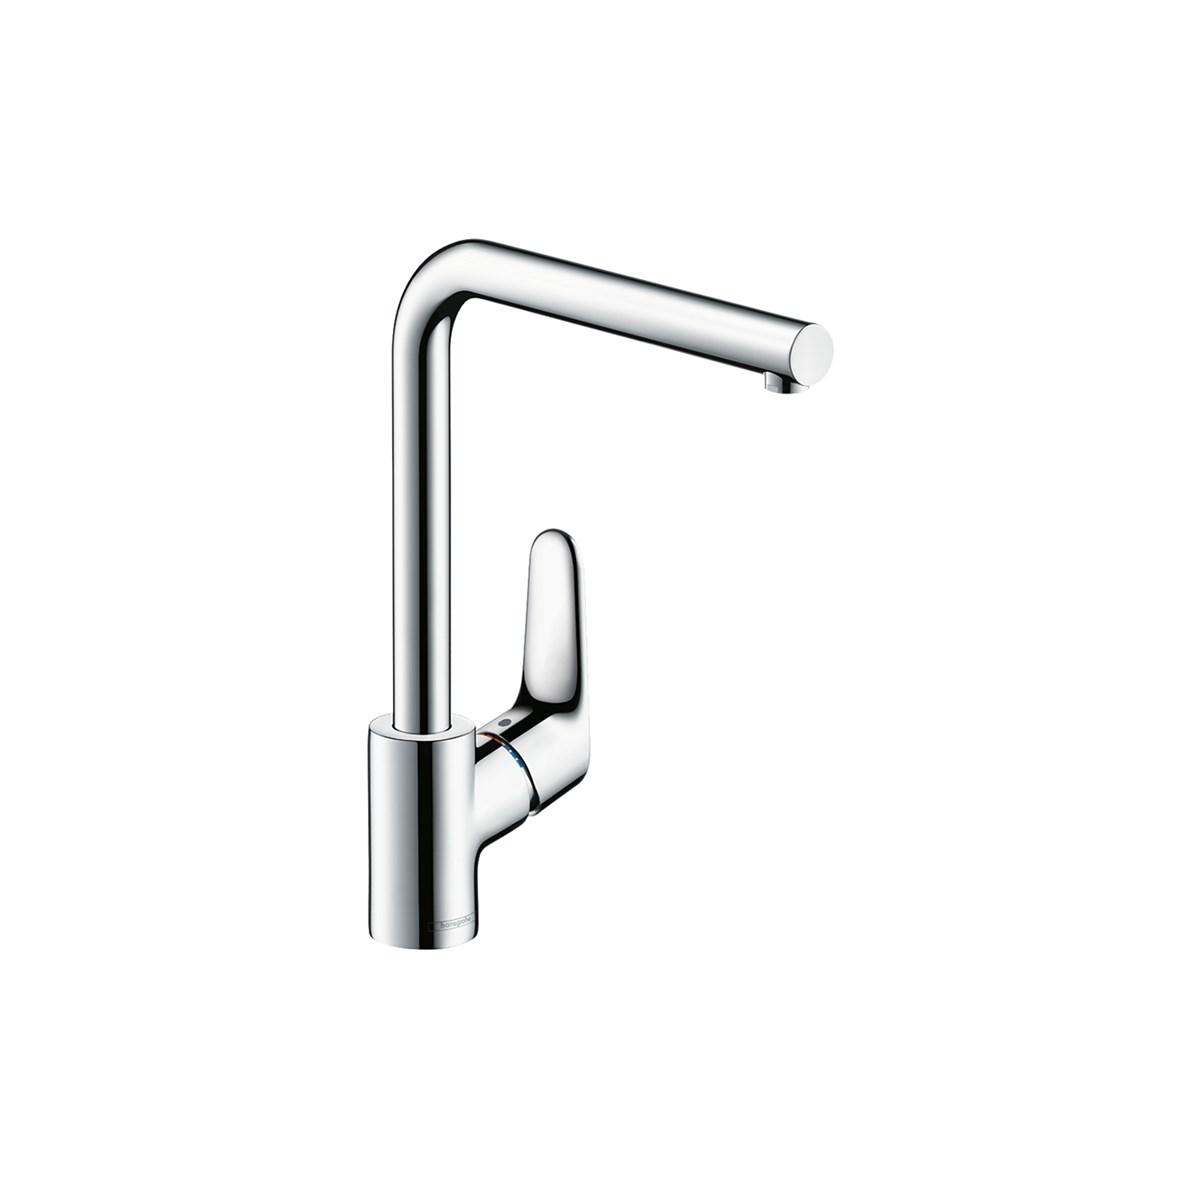 Hansgrohe-Focus-M41-Kitchen-Mixer-280-31817000-Matisse-1